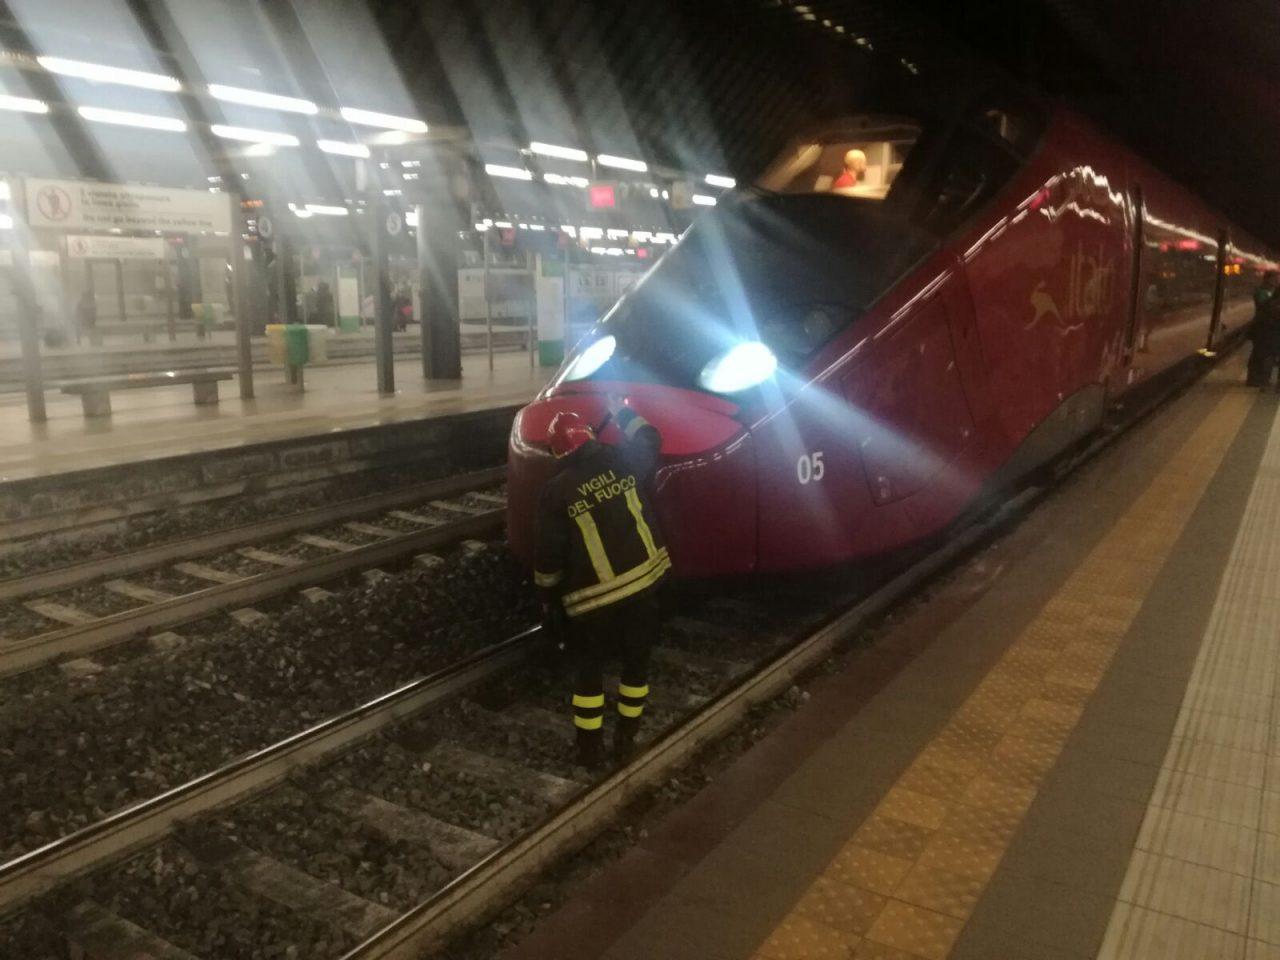 Rho, travolto dal treno